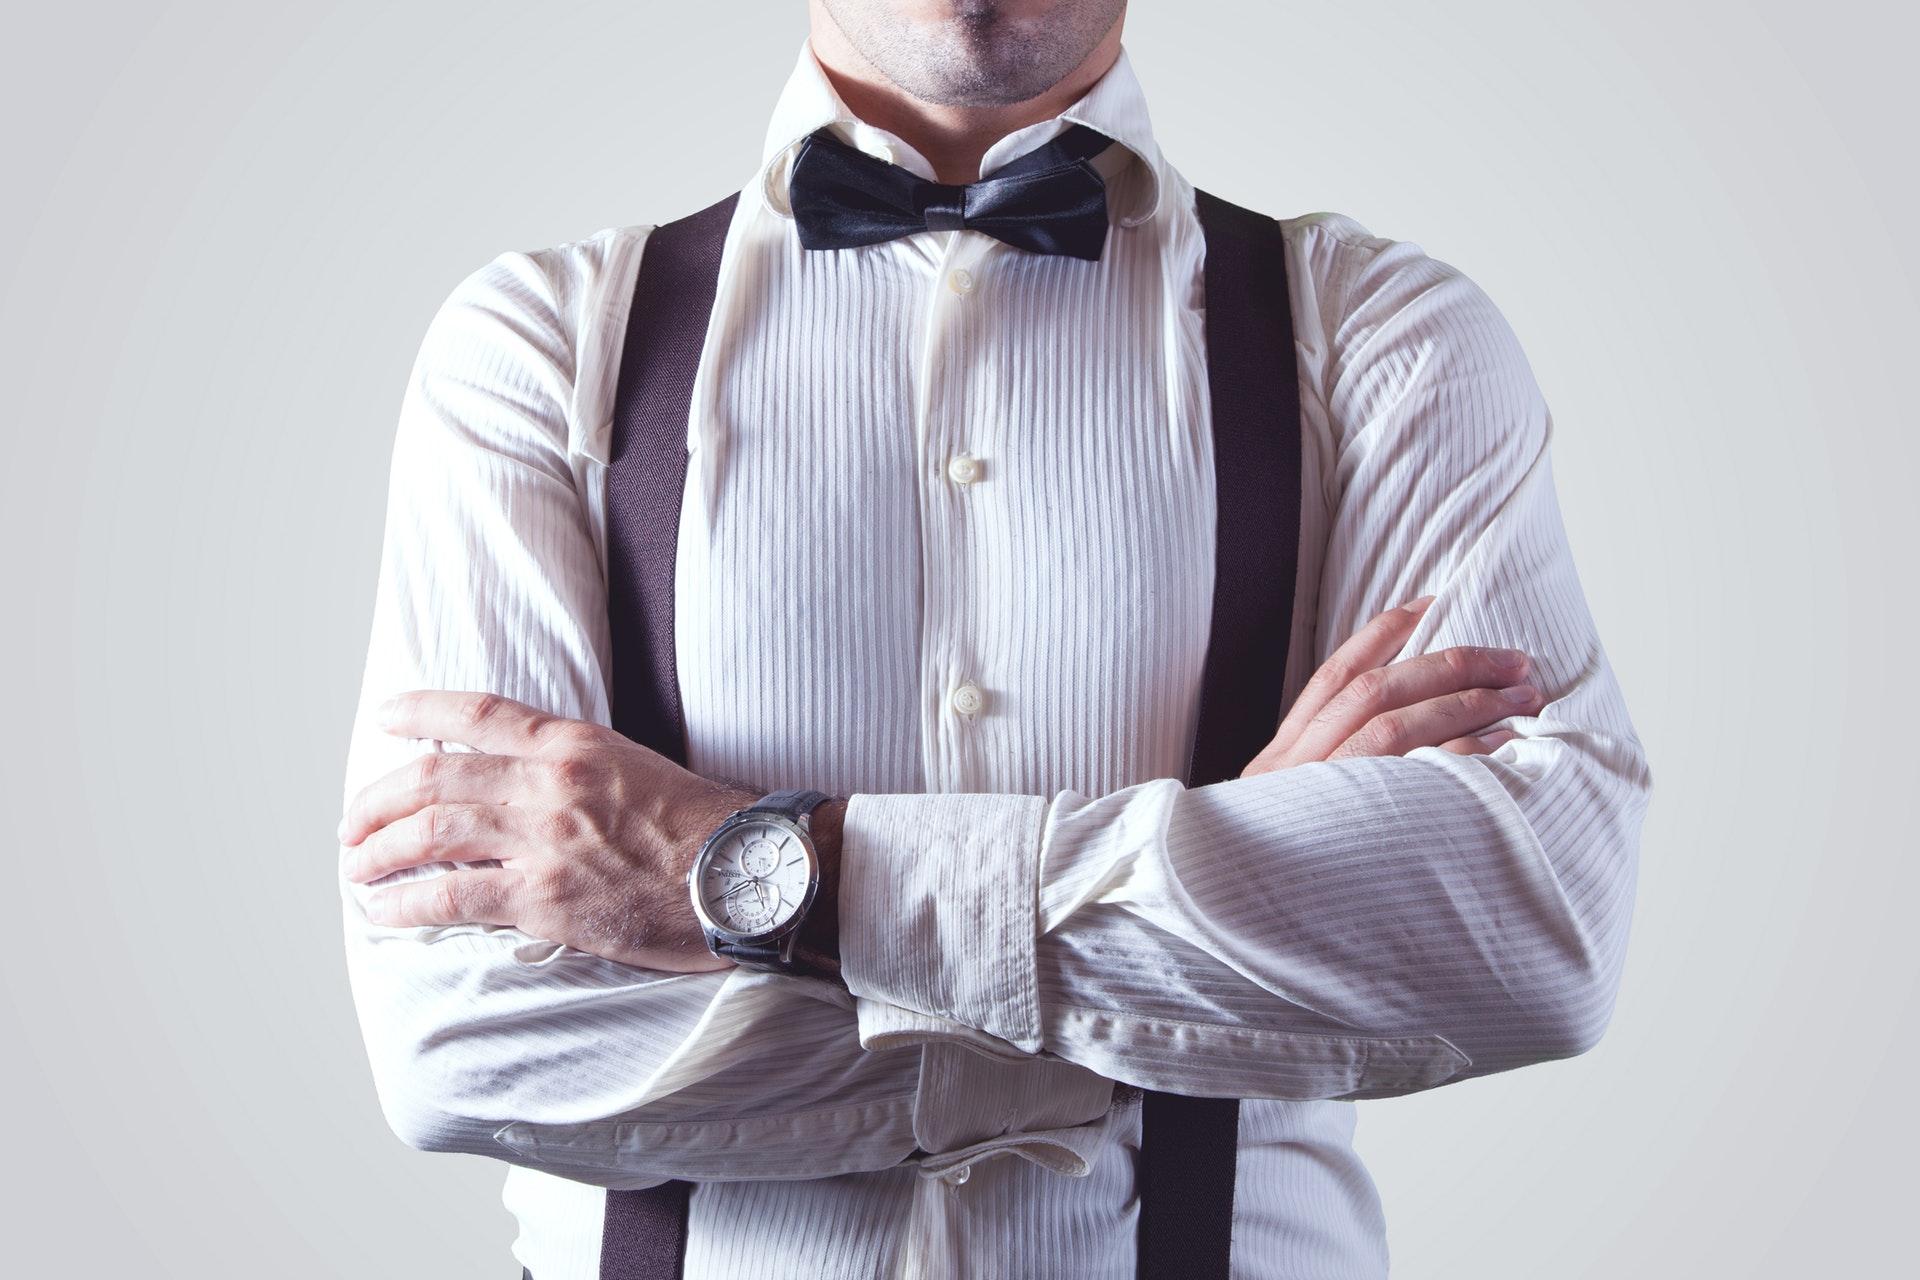 Rozpięte guziki w koszuli – hot or not?